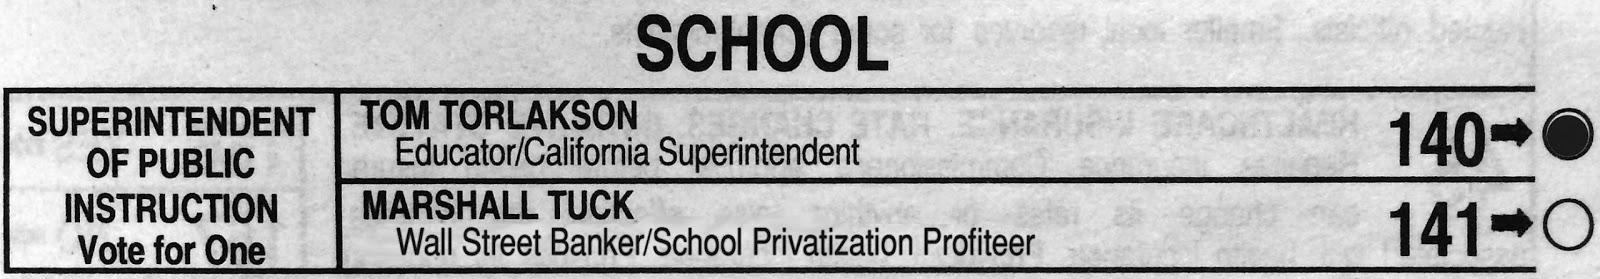 Billionaire extremists spent some $10-Million pushing banker Marshall Tuck. Resist! Vote teacher, VOTE Tom Torlakson!